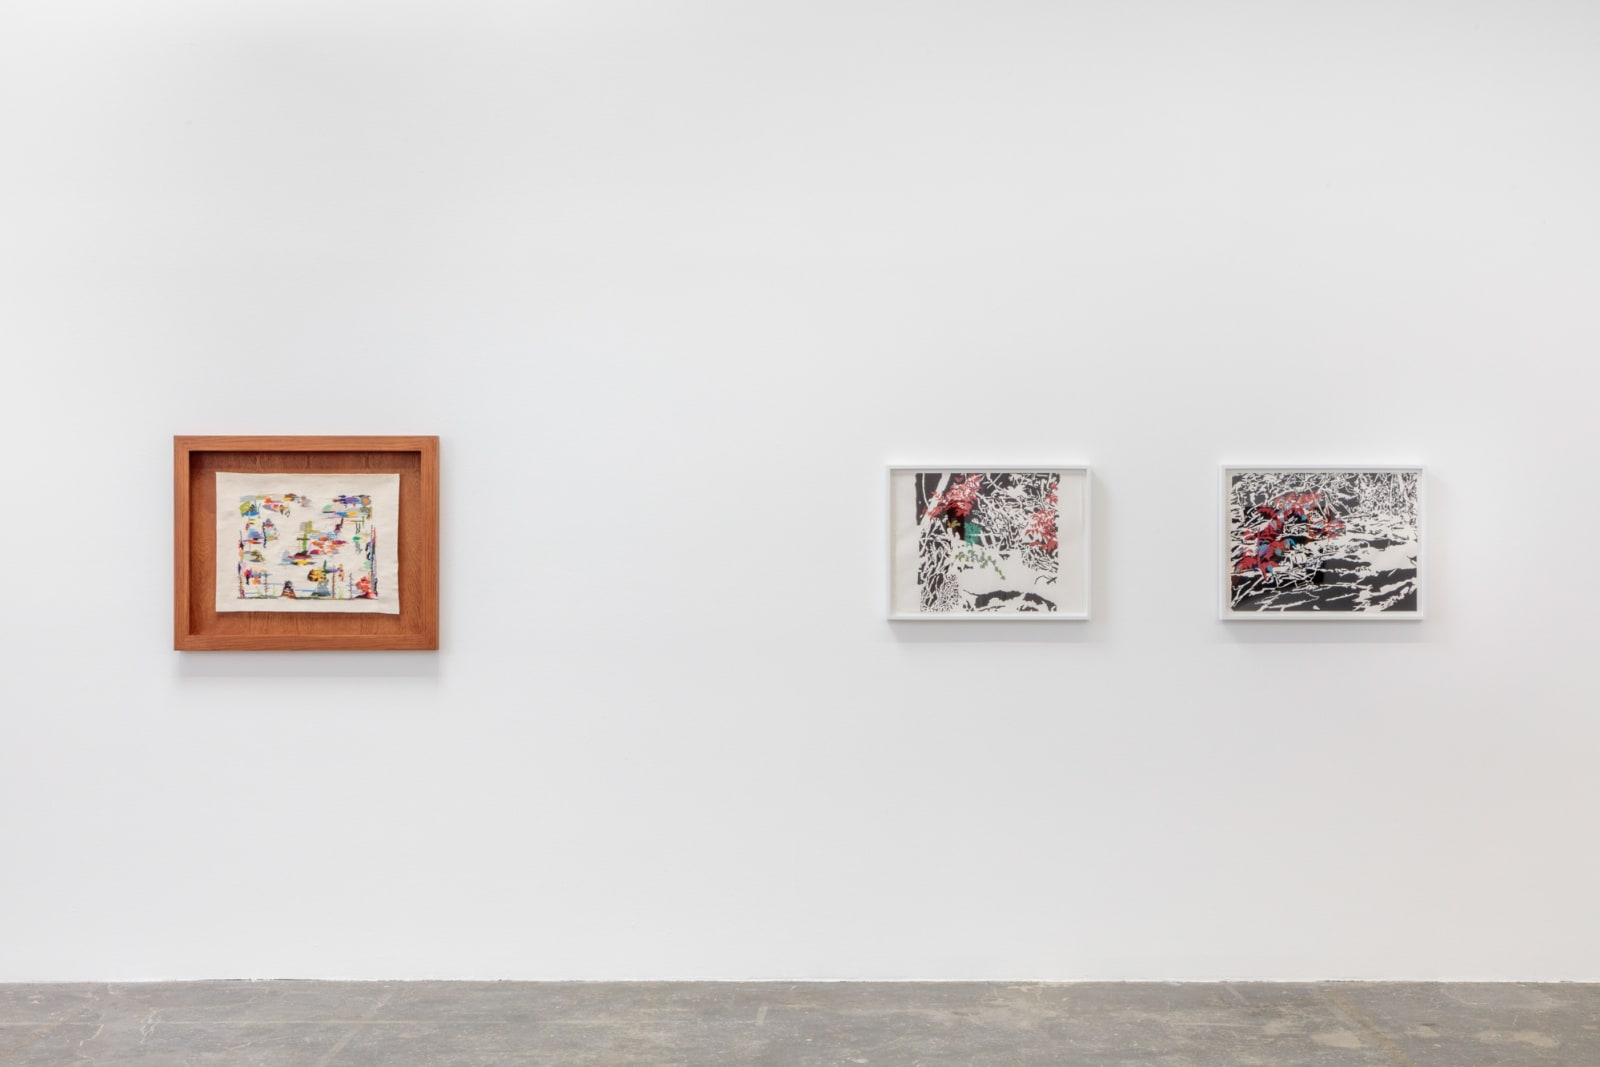 Iliodora Margellos & Francesca Gabbiani